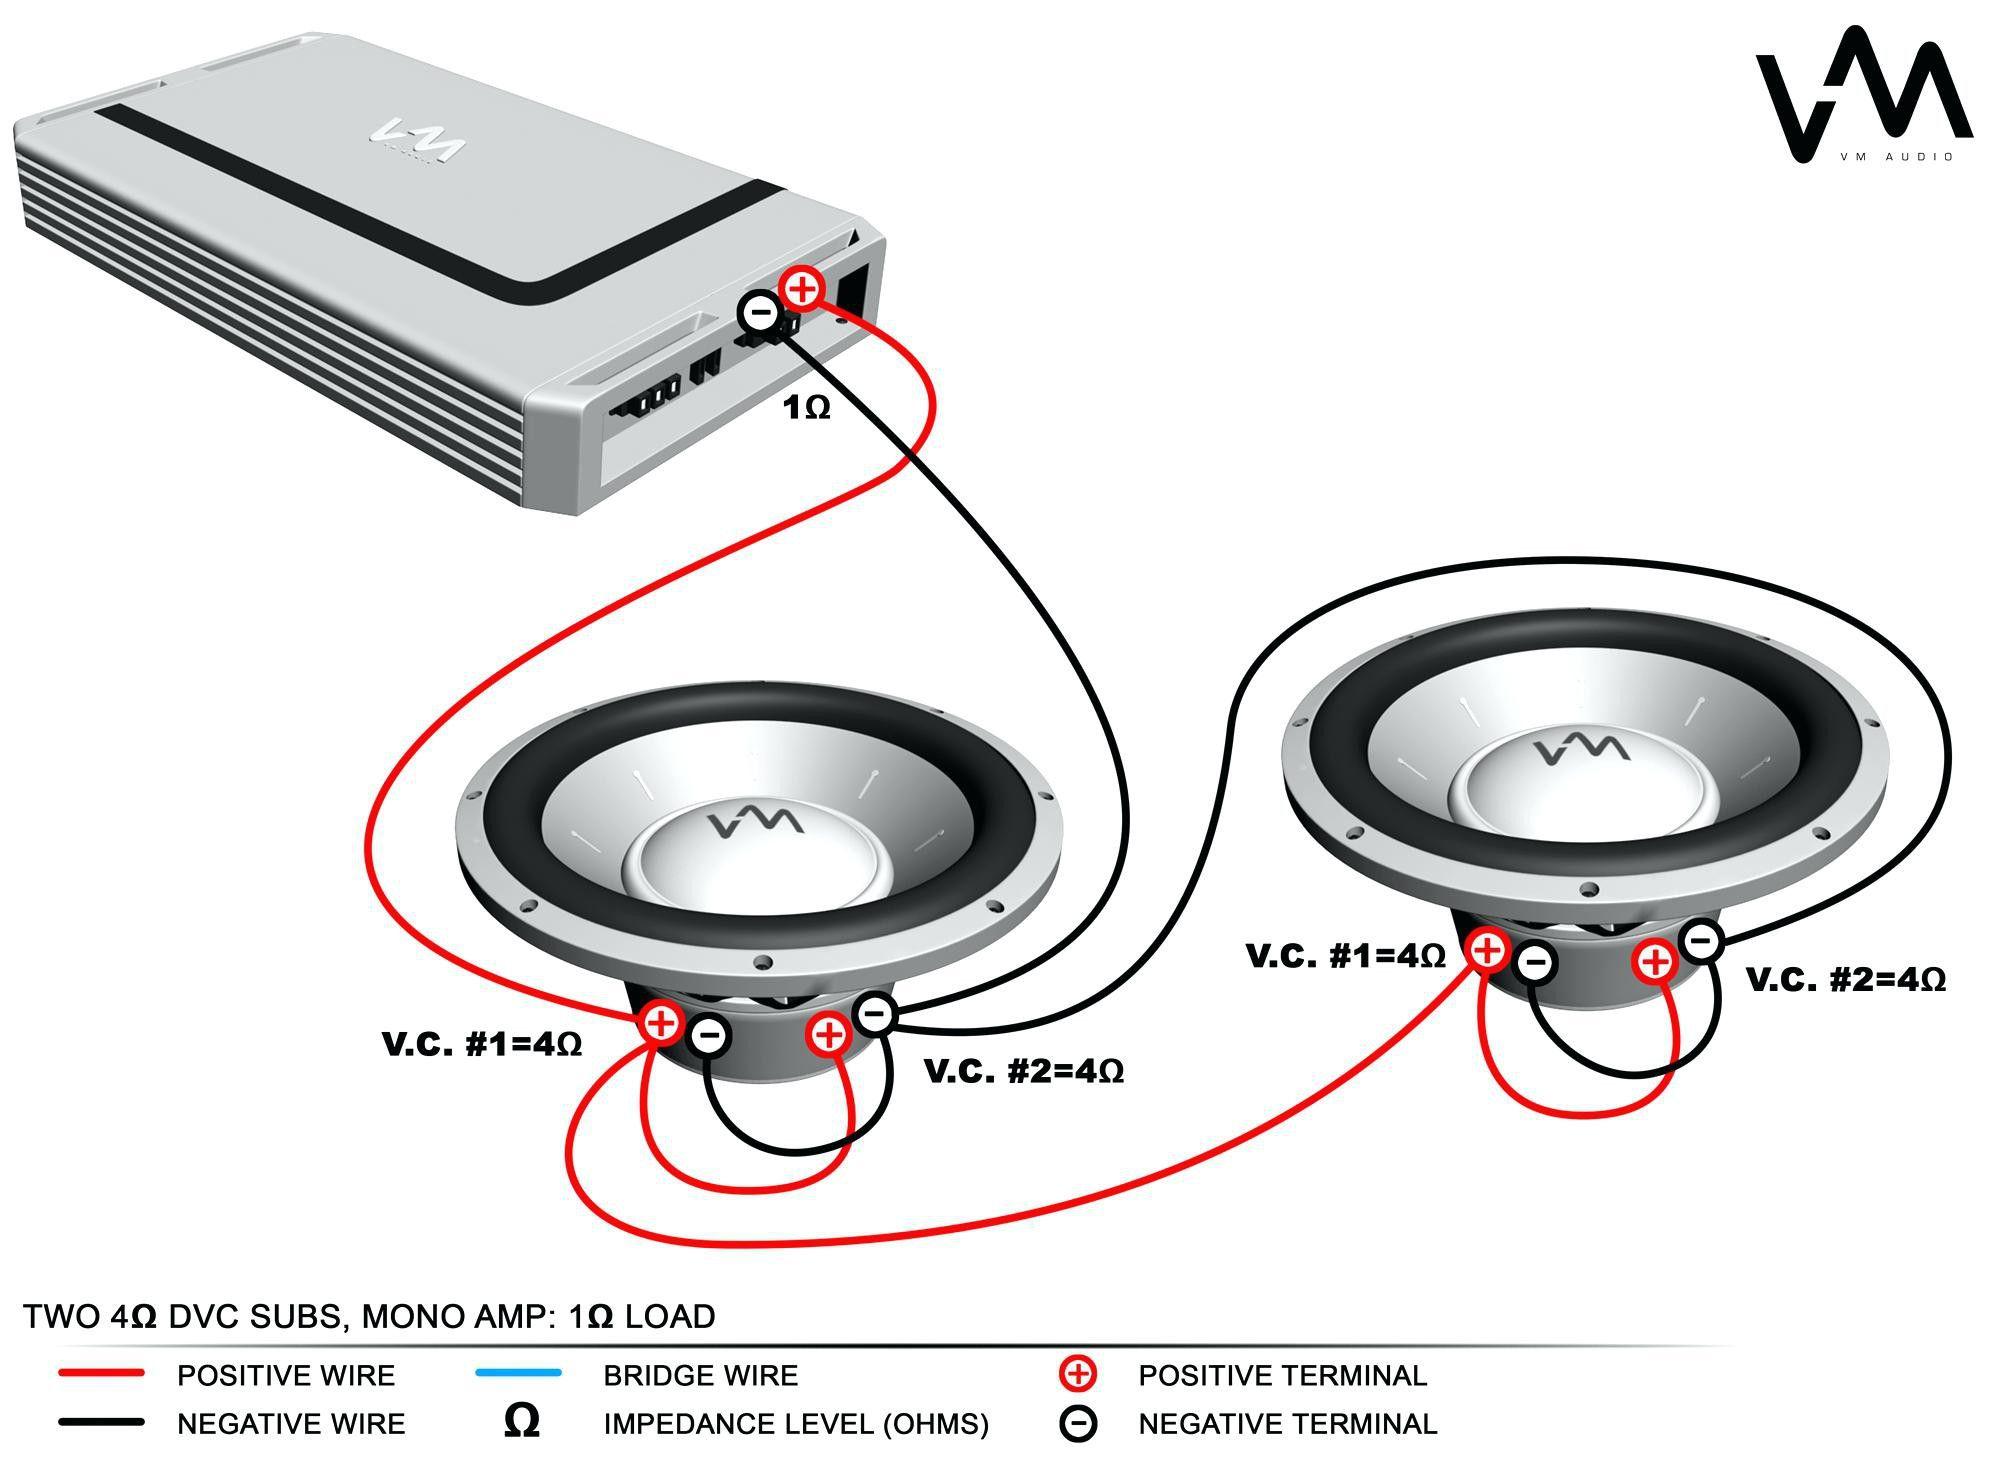 1 ohm sub wiring diagram blogs throughout dual speaker speaker wiring diagram 1ohm [ 2000 x 1458 Pixel ]